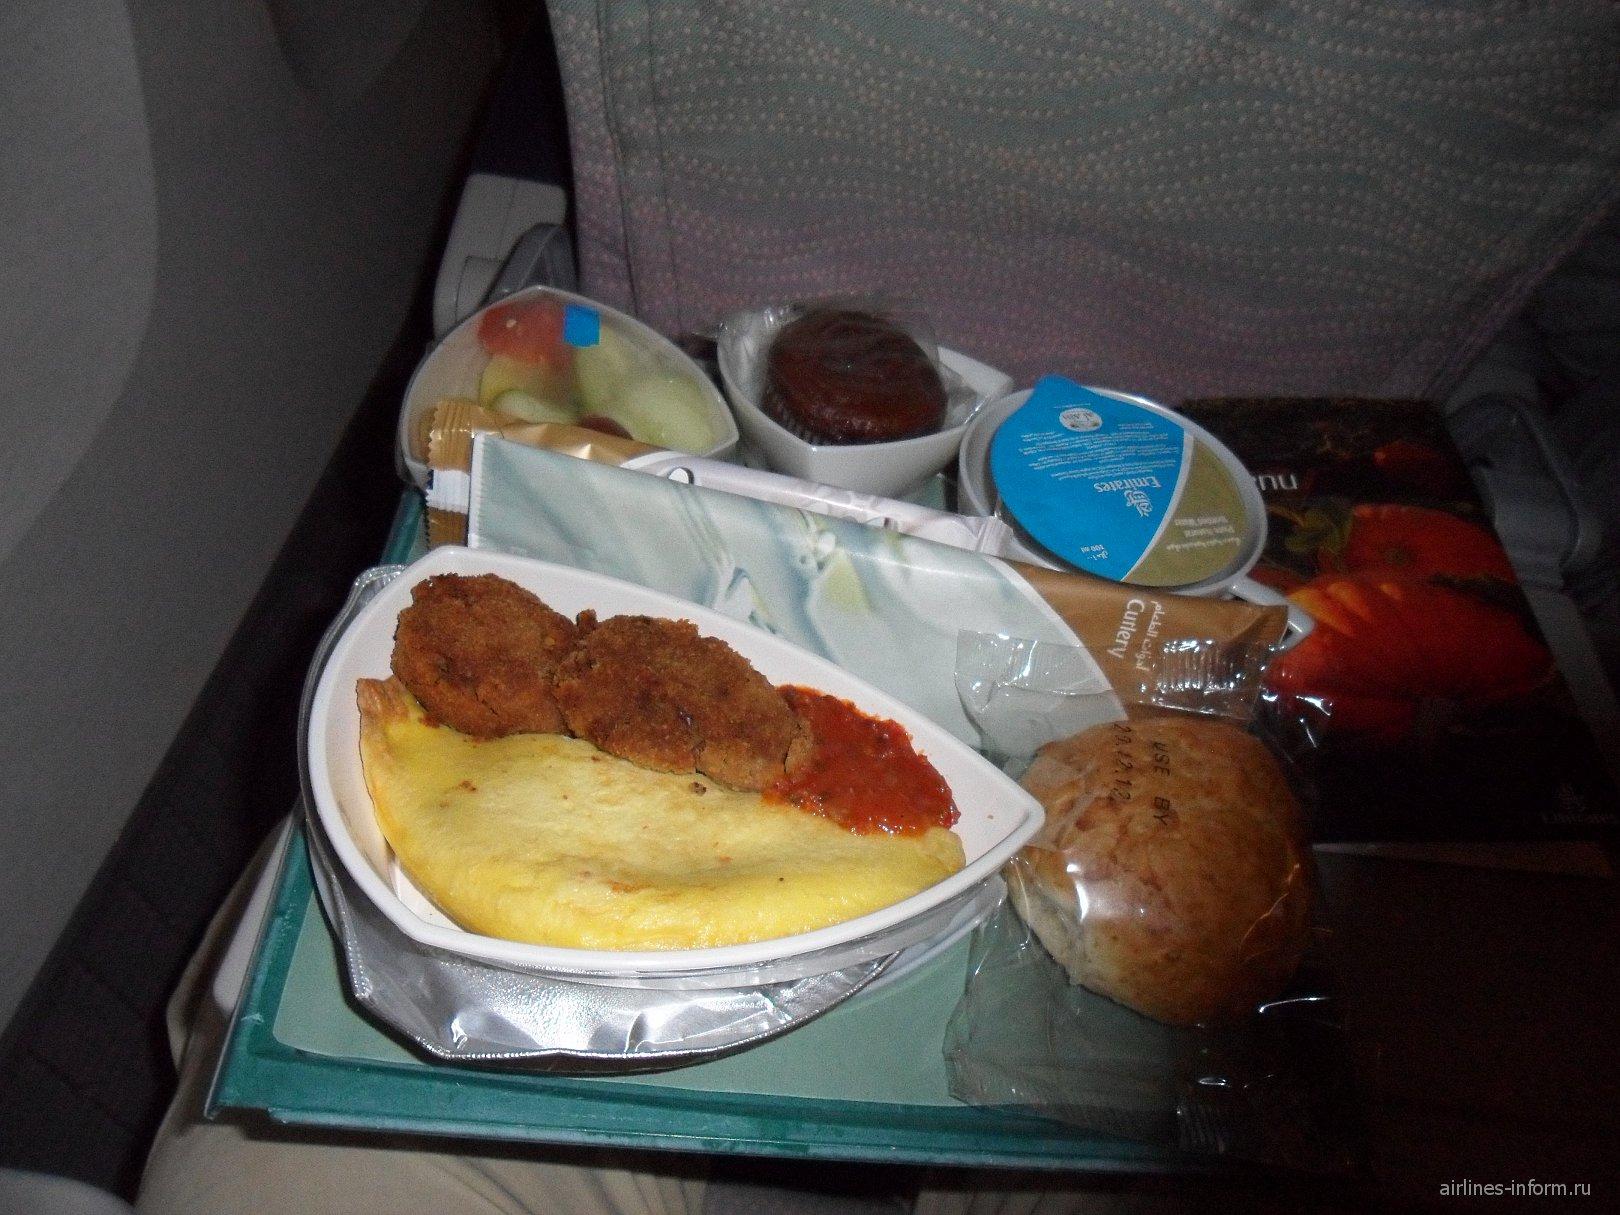 Питание на рейсе Emirates Дели-Дубай